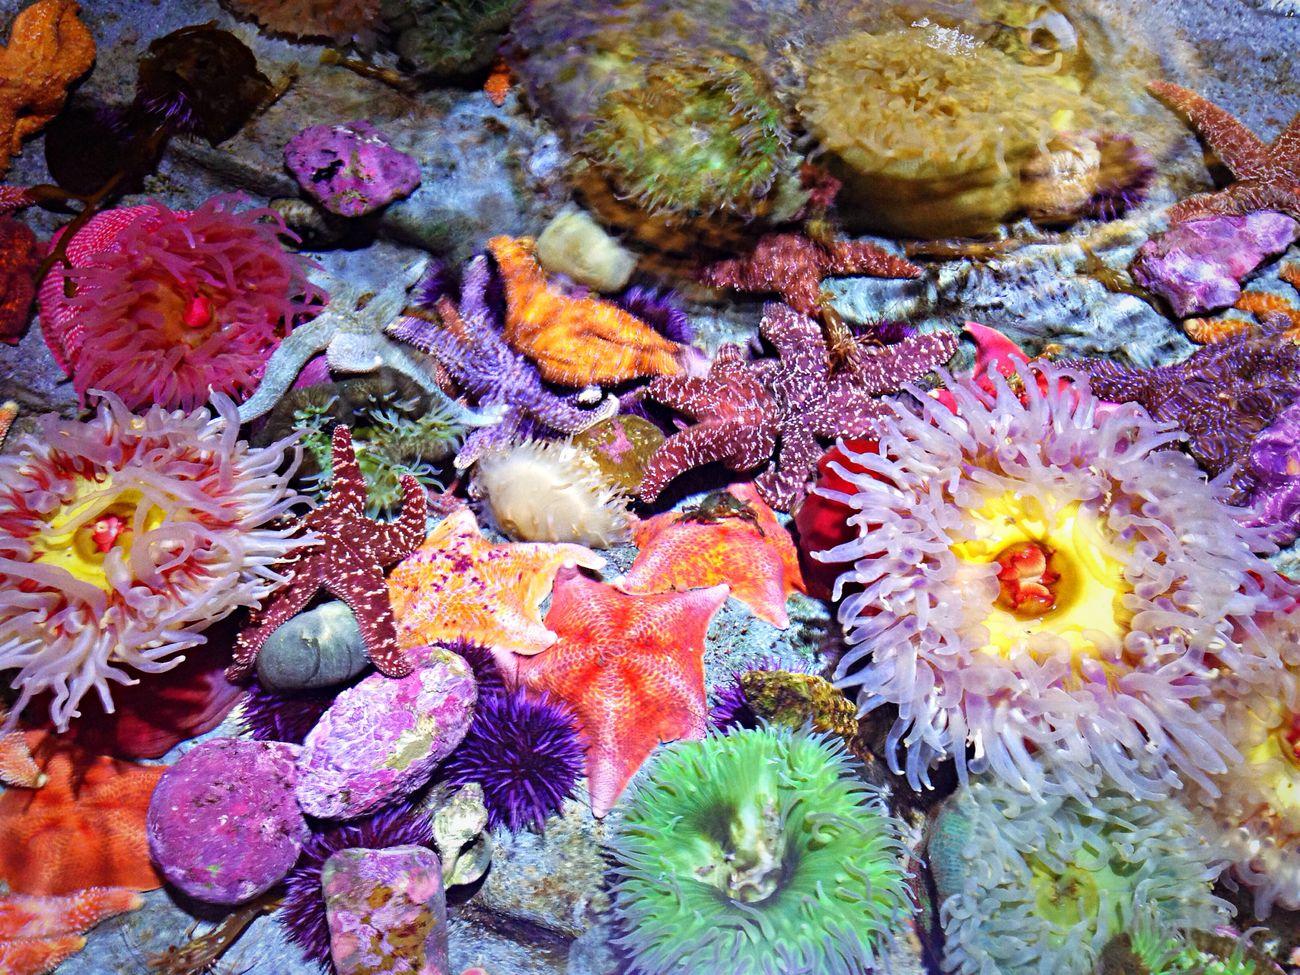 Anemone - Nemo's spring time under the sea Nature EyeEm Best Shots Taking Photos Enjoying Life